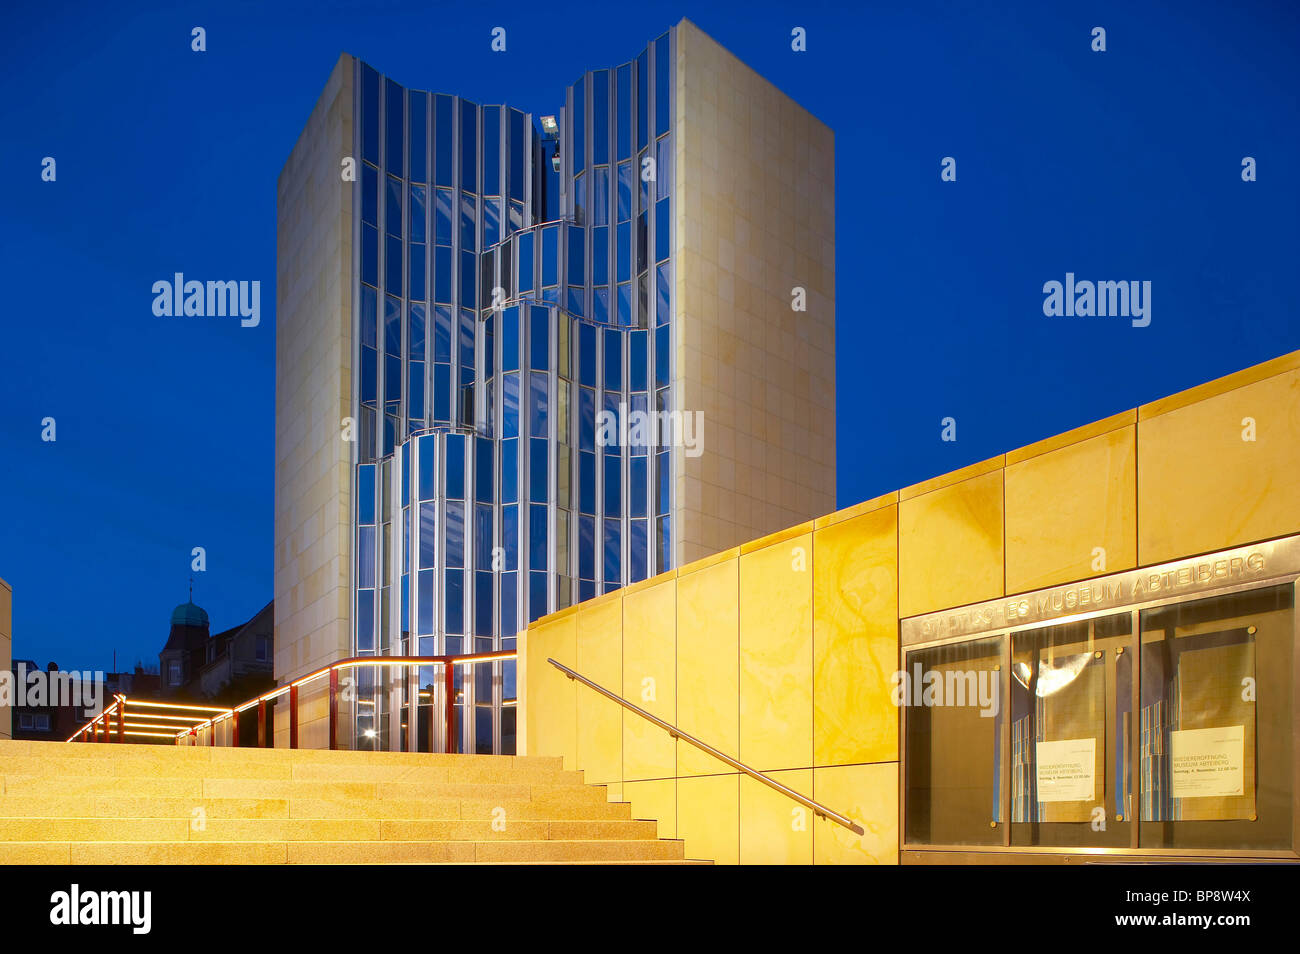 Evening, Abteiberg Museum, Architect Hans Hollein, Moenchengladbach, North Rhine-Westphalia, Germany, Europe - Stock Image